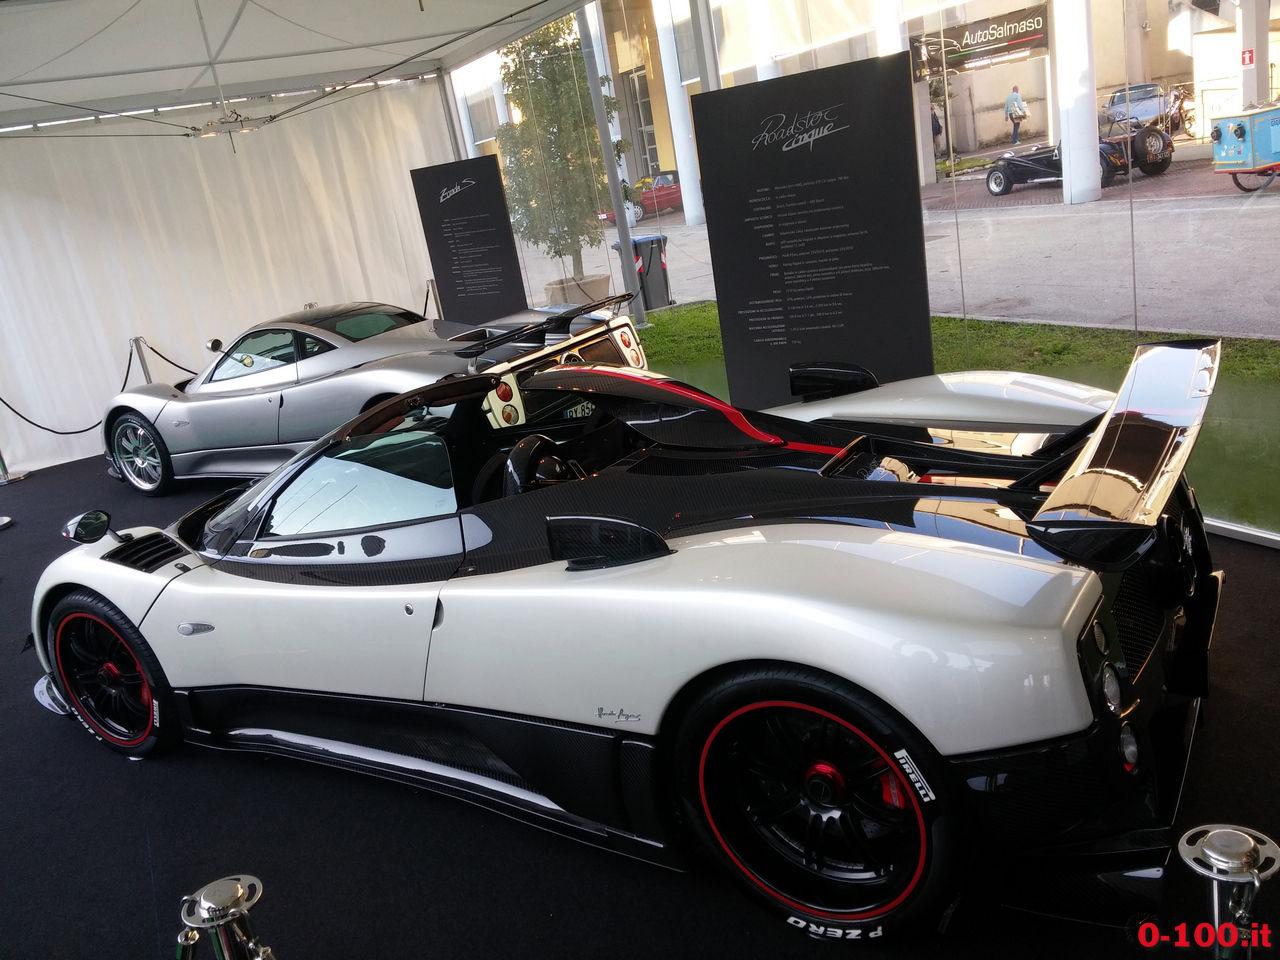 automotodepoca-2016-pagani-car-market-mercato-auto-prezzo-price_0-10048